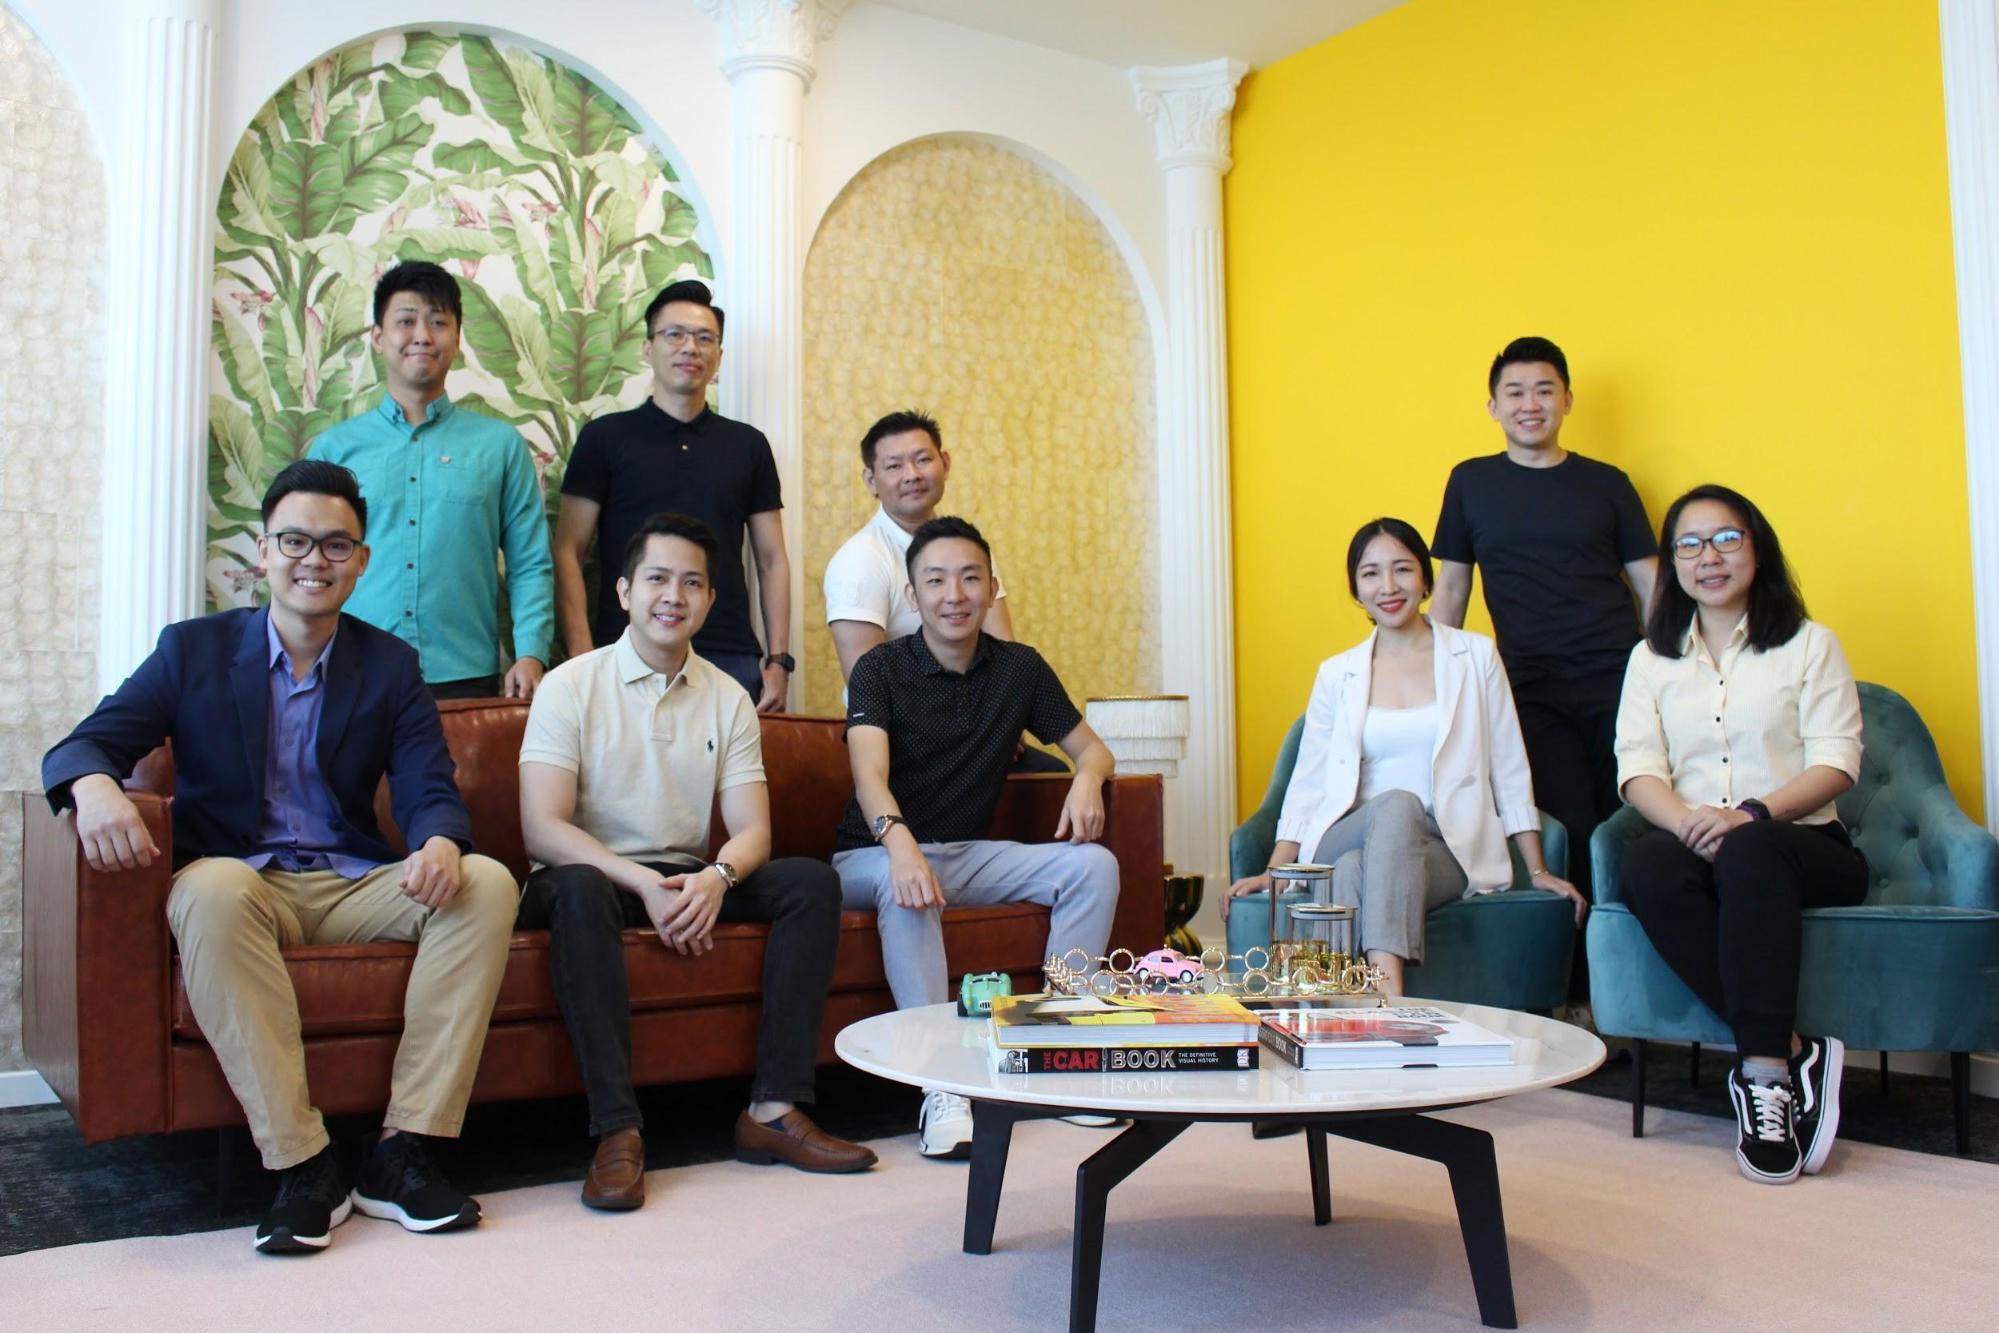 500 Startups & Misk Innovation to Launch Second Batch of the Misk 500 Accelerator Program